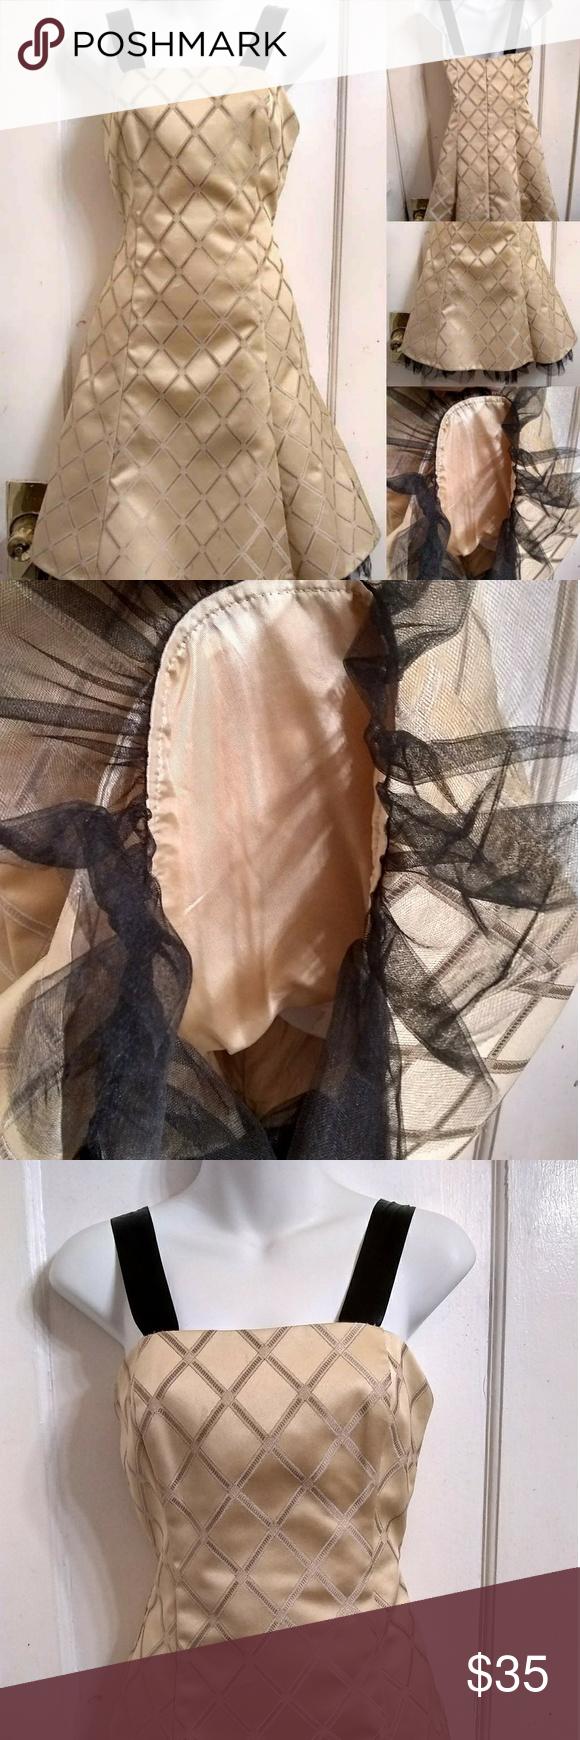 Vtg jessica mcclintock brocade prom dress sz my posh closet